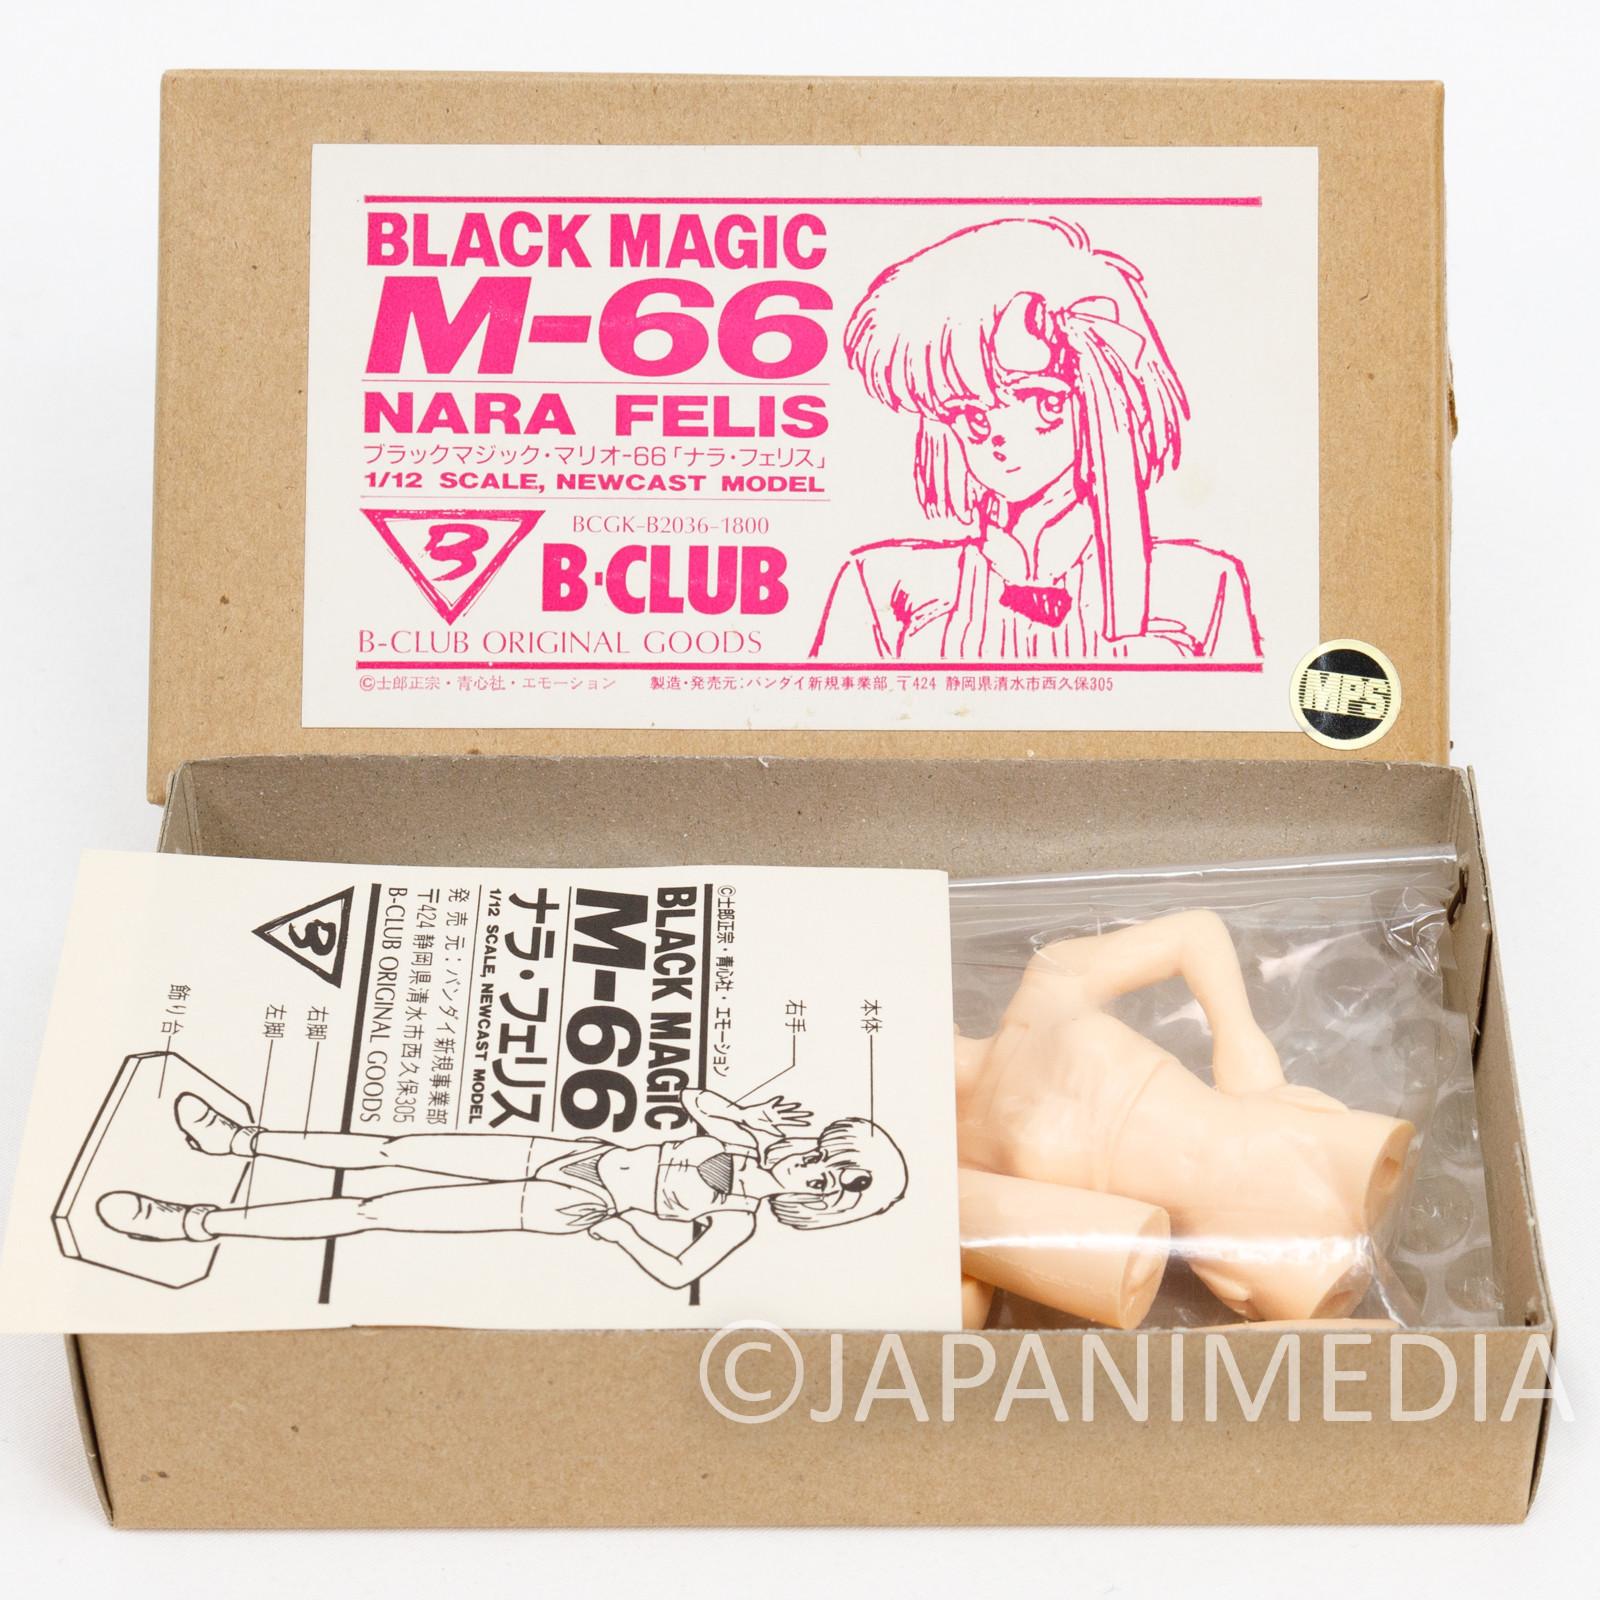 Black Magic M-66 Nara Ferris 1/12 Scale Resin Cast Model Kit Shirow Masamune